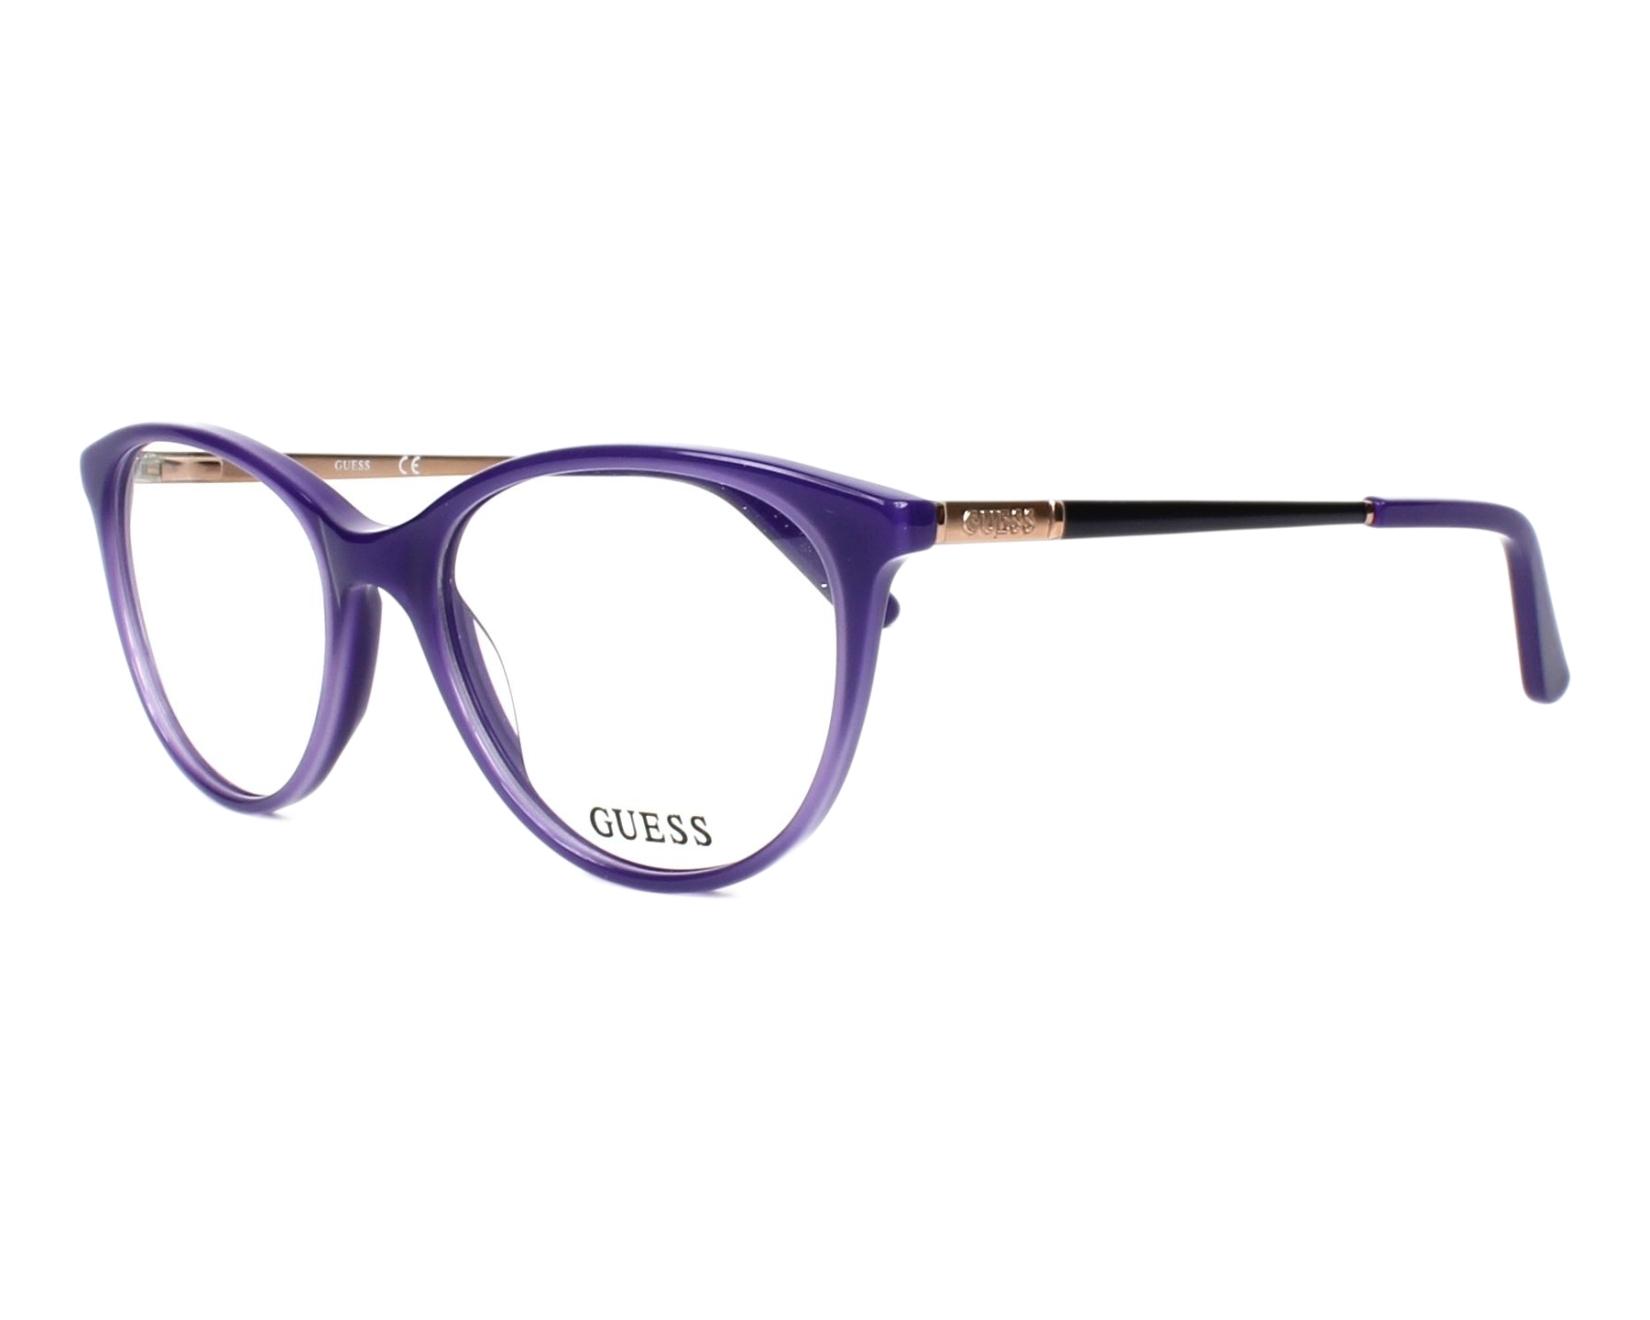 d72abb15307 eyeglasses Guess GU-2565 081 52-17 Purple Copper profile view